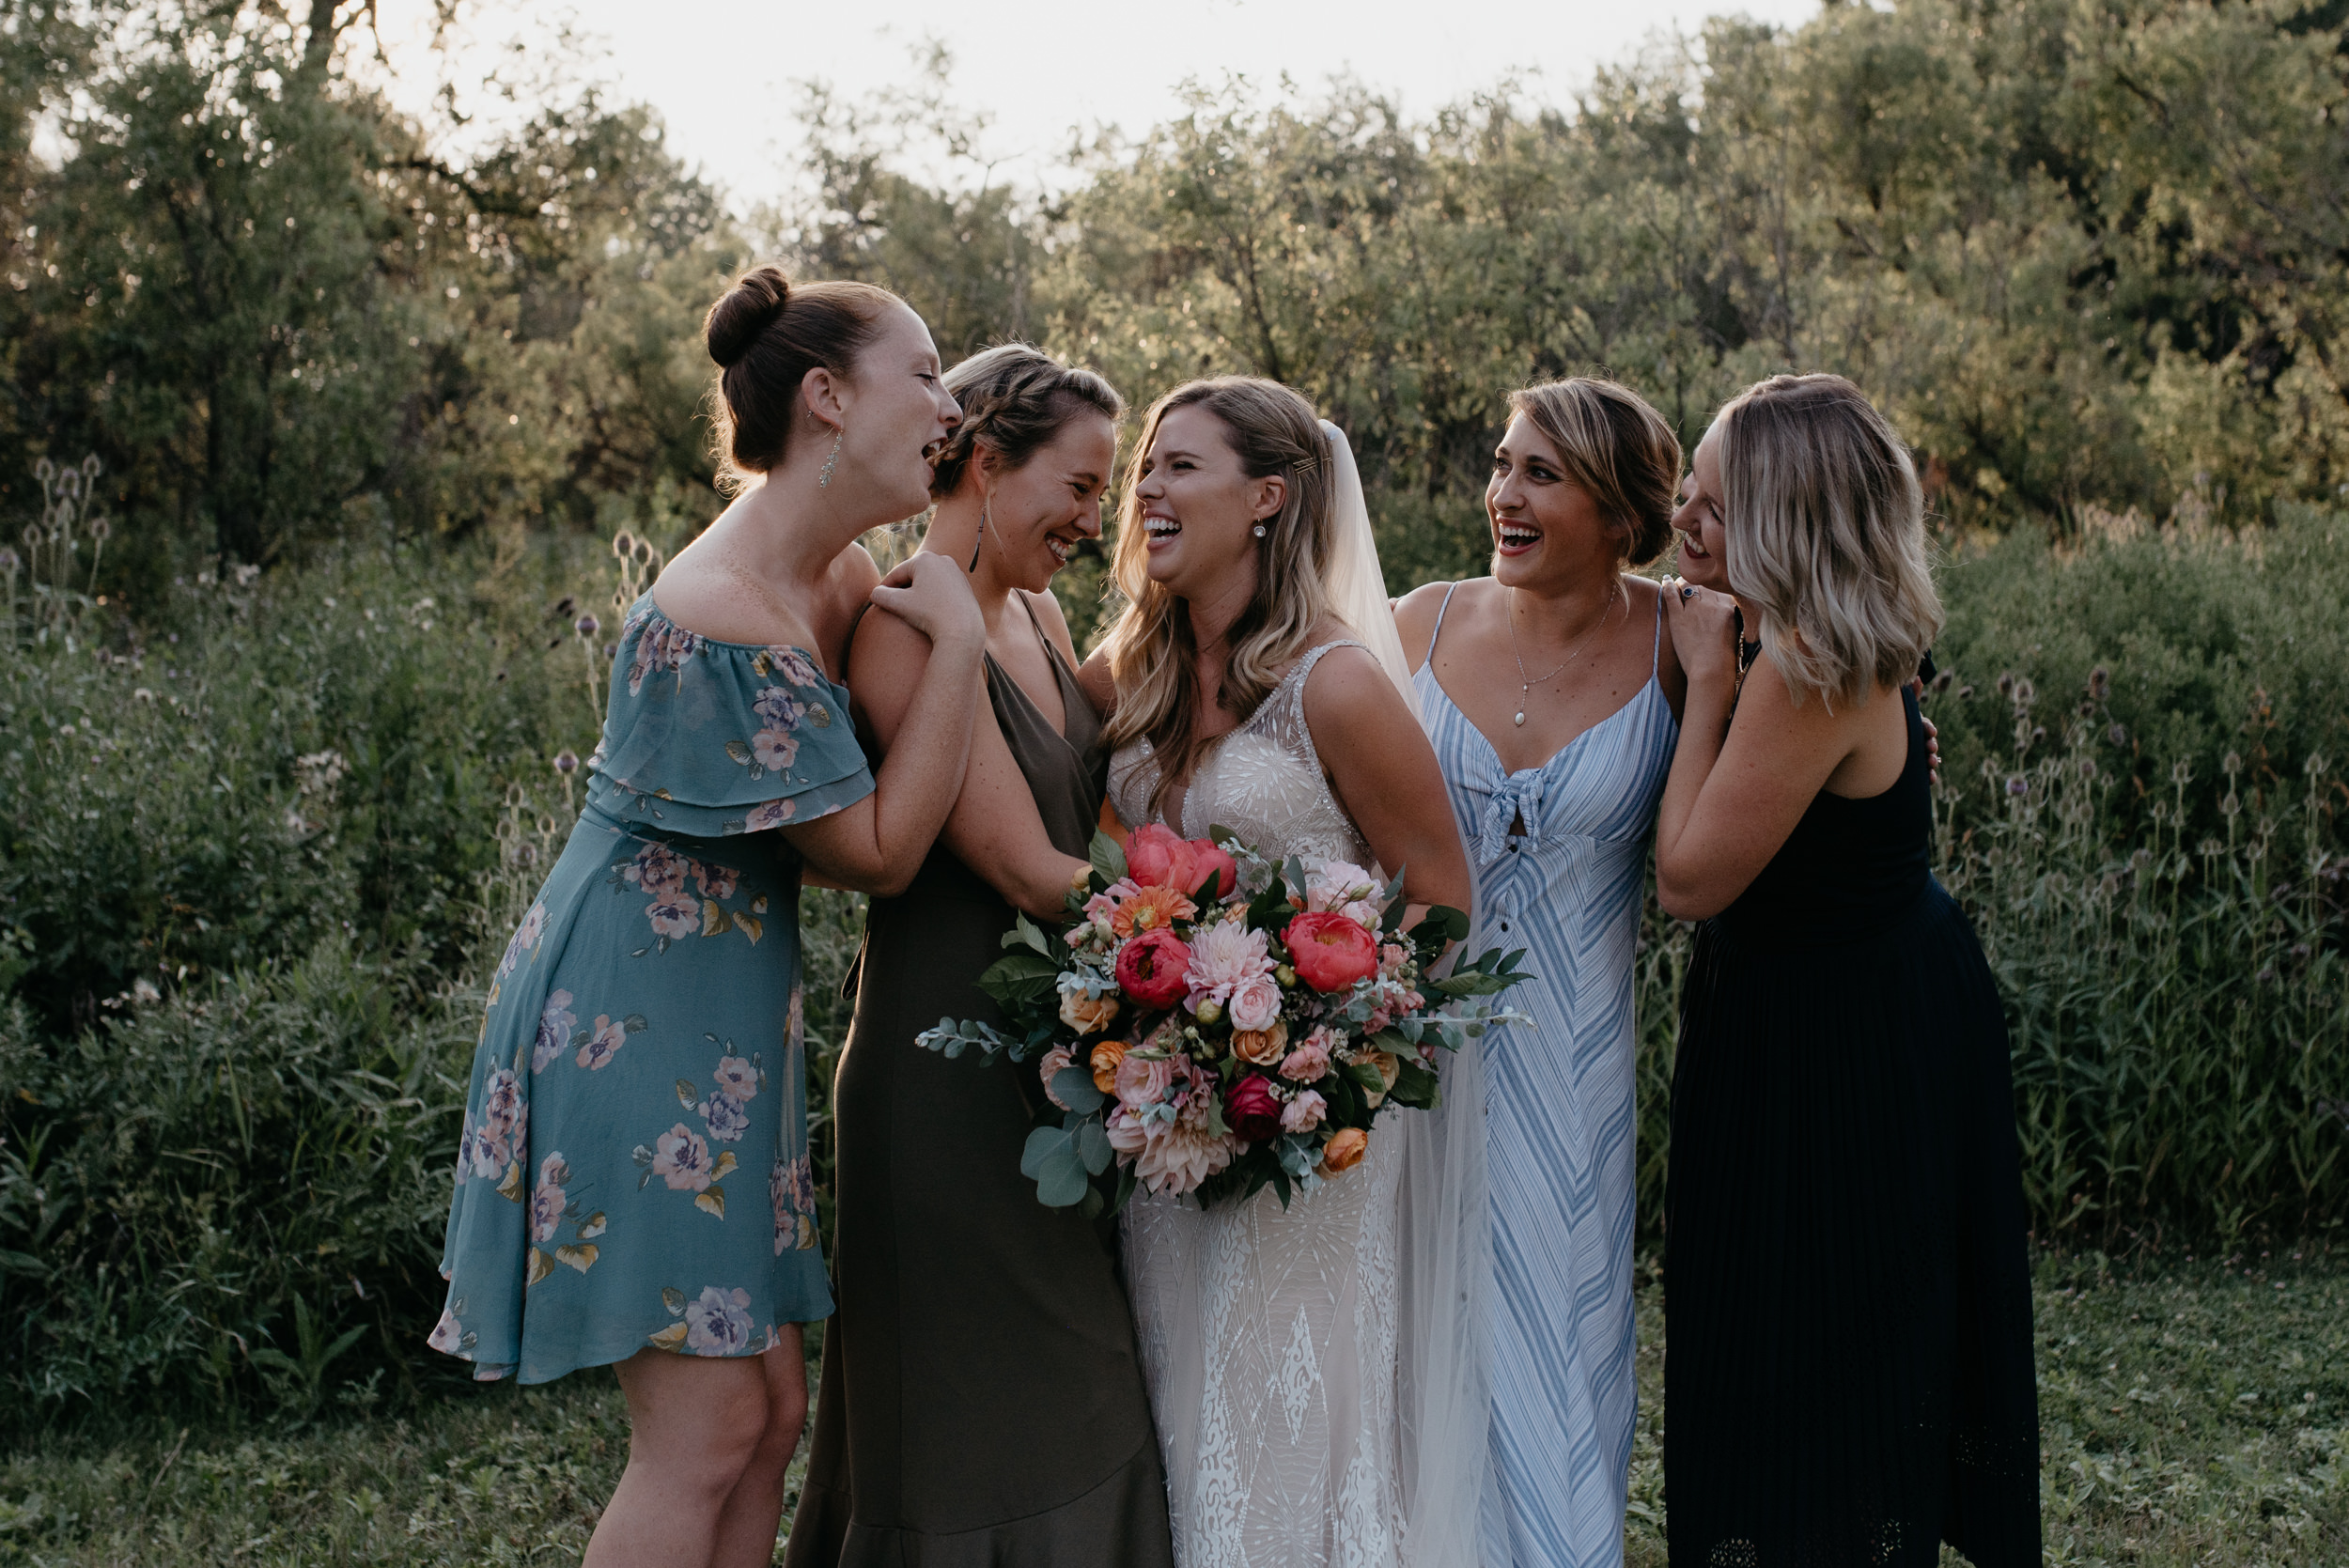 Bridesmaids photos at Three Leaf Farm wedding in Boulder, Colorado. Colorado mountain elopement and wedding photographer.